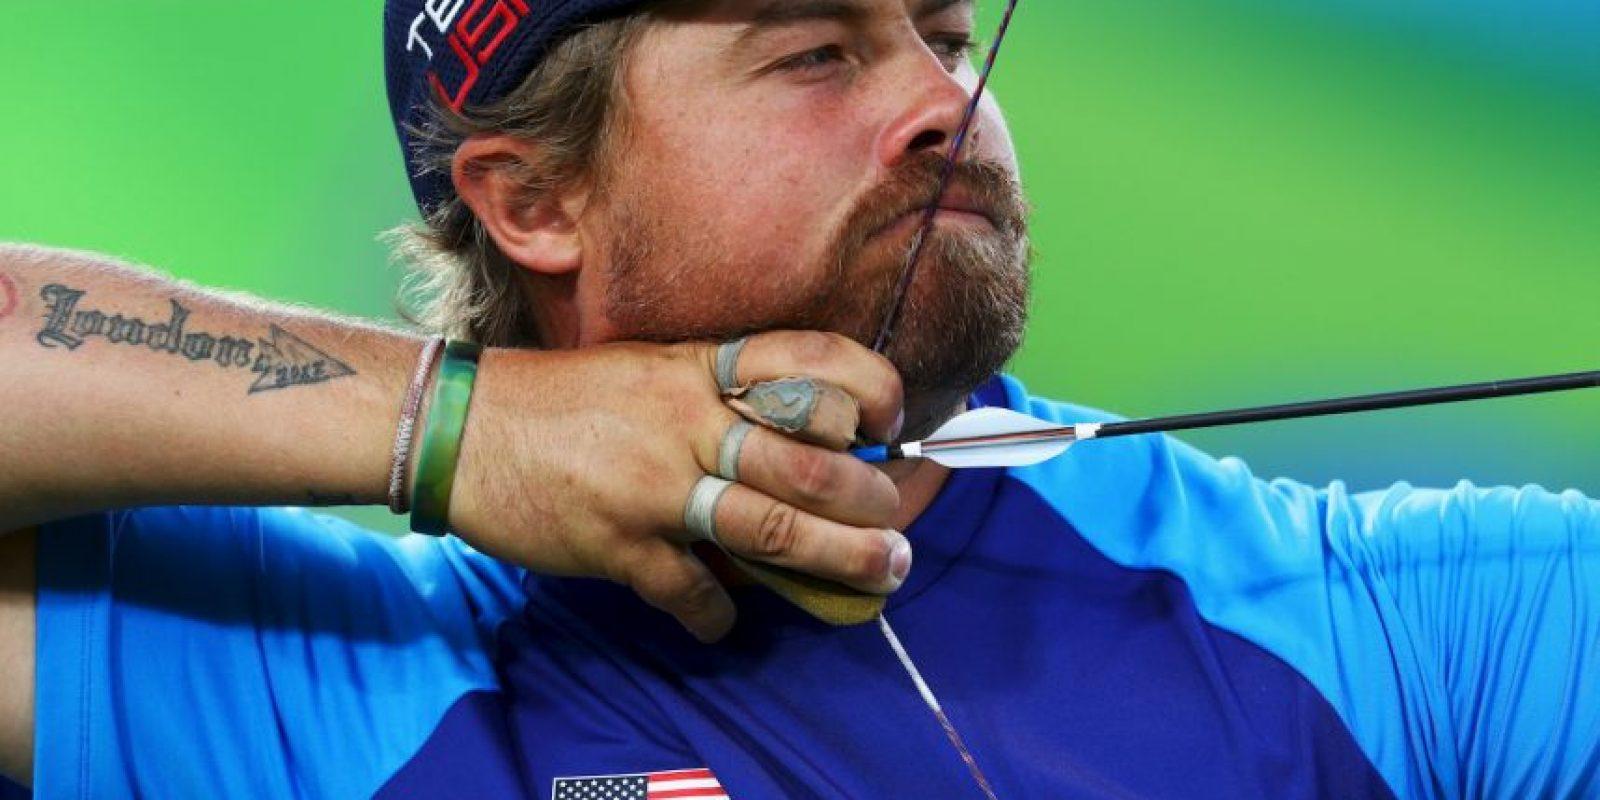 Ganó medalla de plata en equipos, en tiro con arco Foto:Getty Images